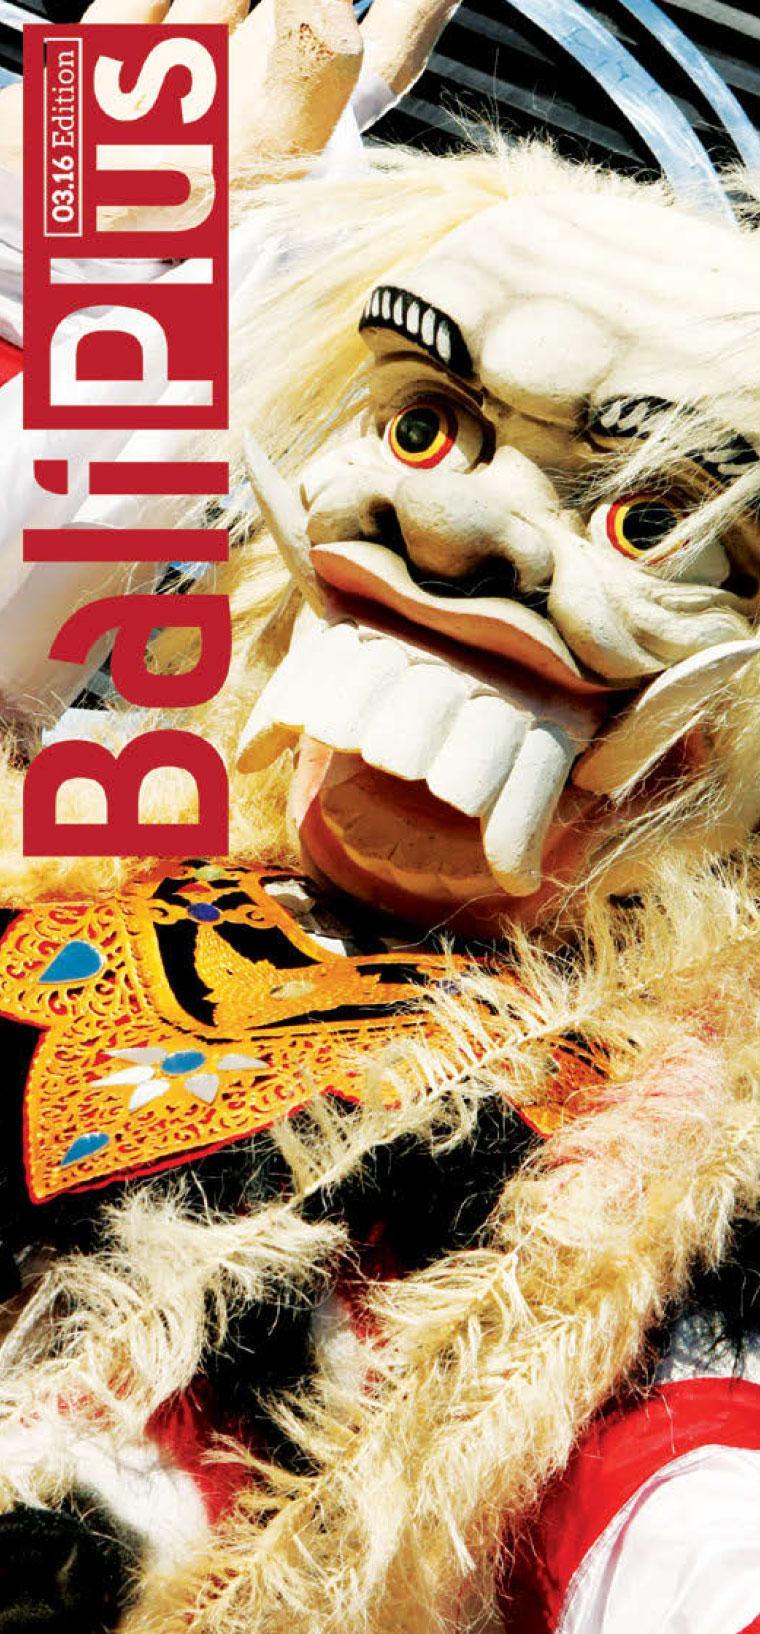 BALI PLUS Digital Magazine March 2016